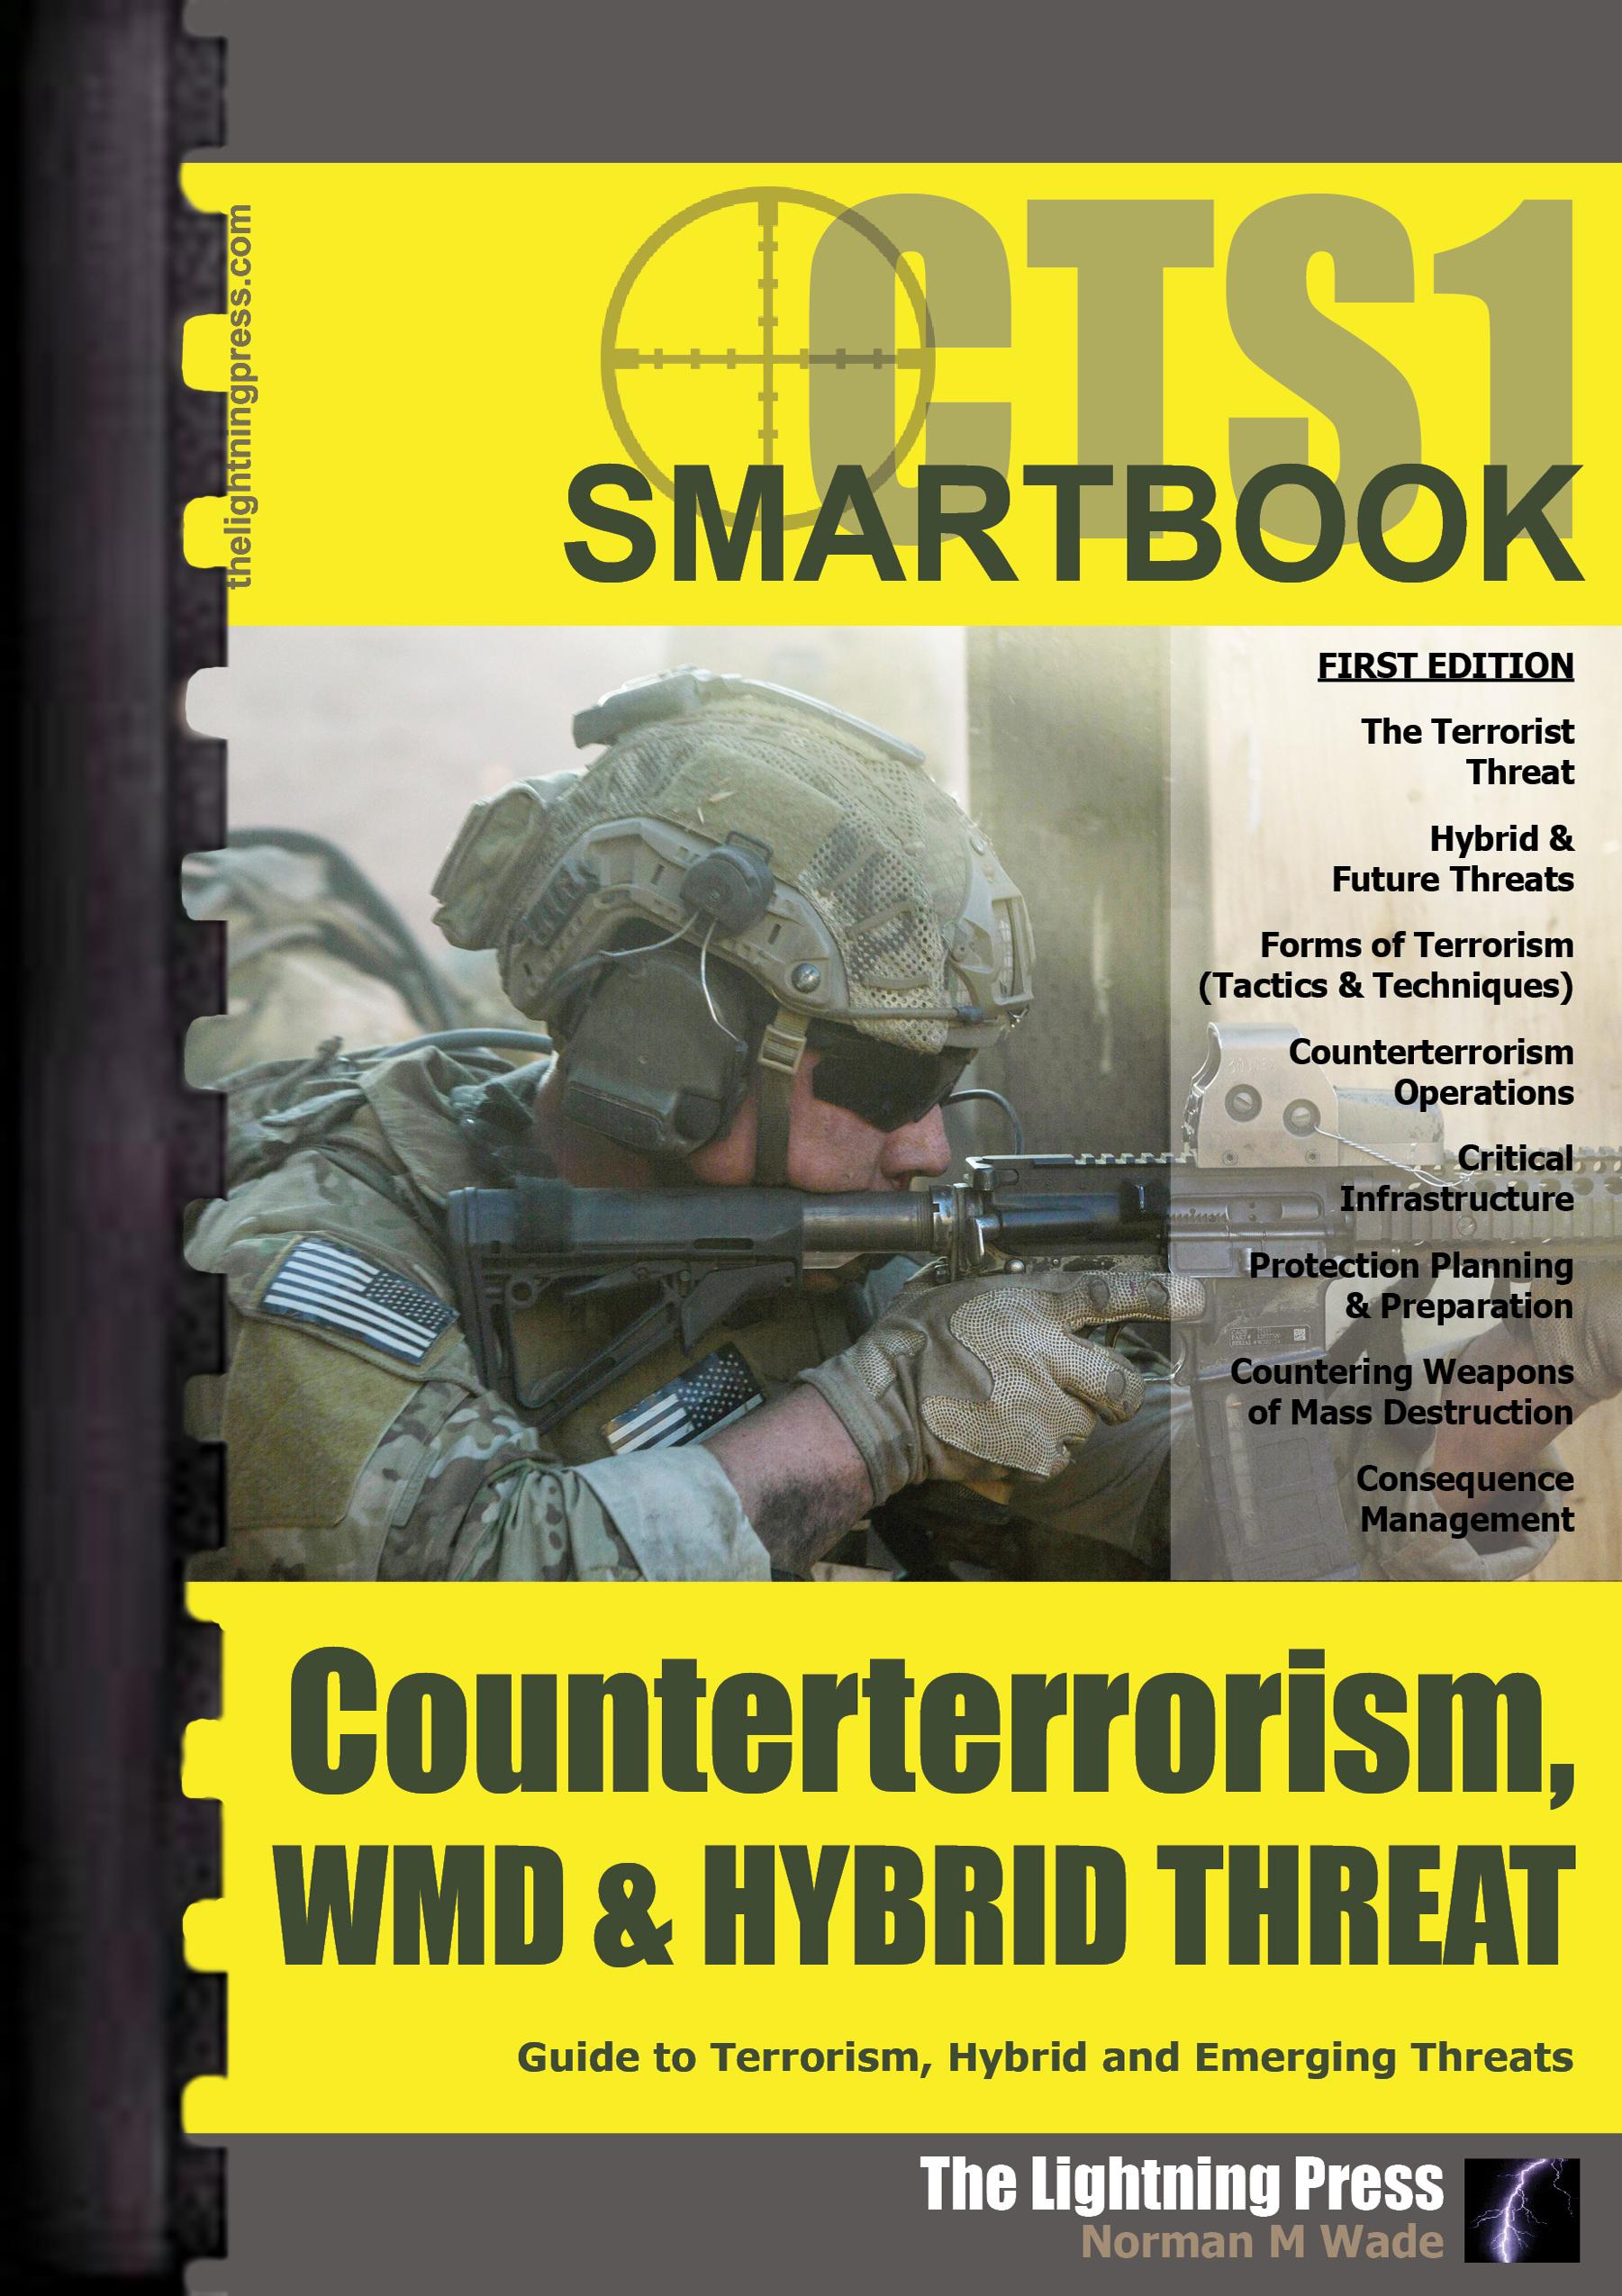 CTS1: The Counterterrorism, WMD & Hybrid Threat SMARTbook (Plastic-Comb)